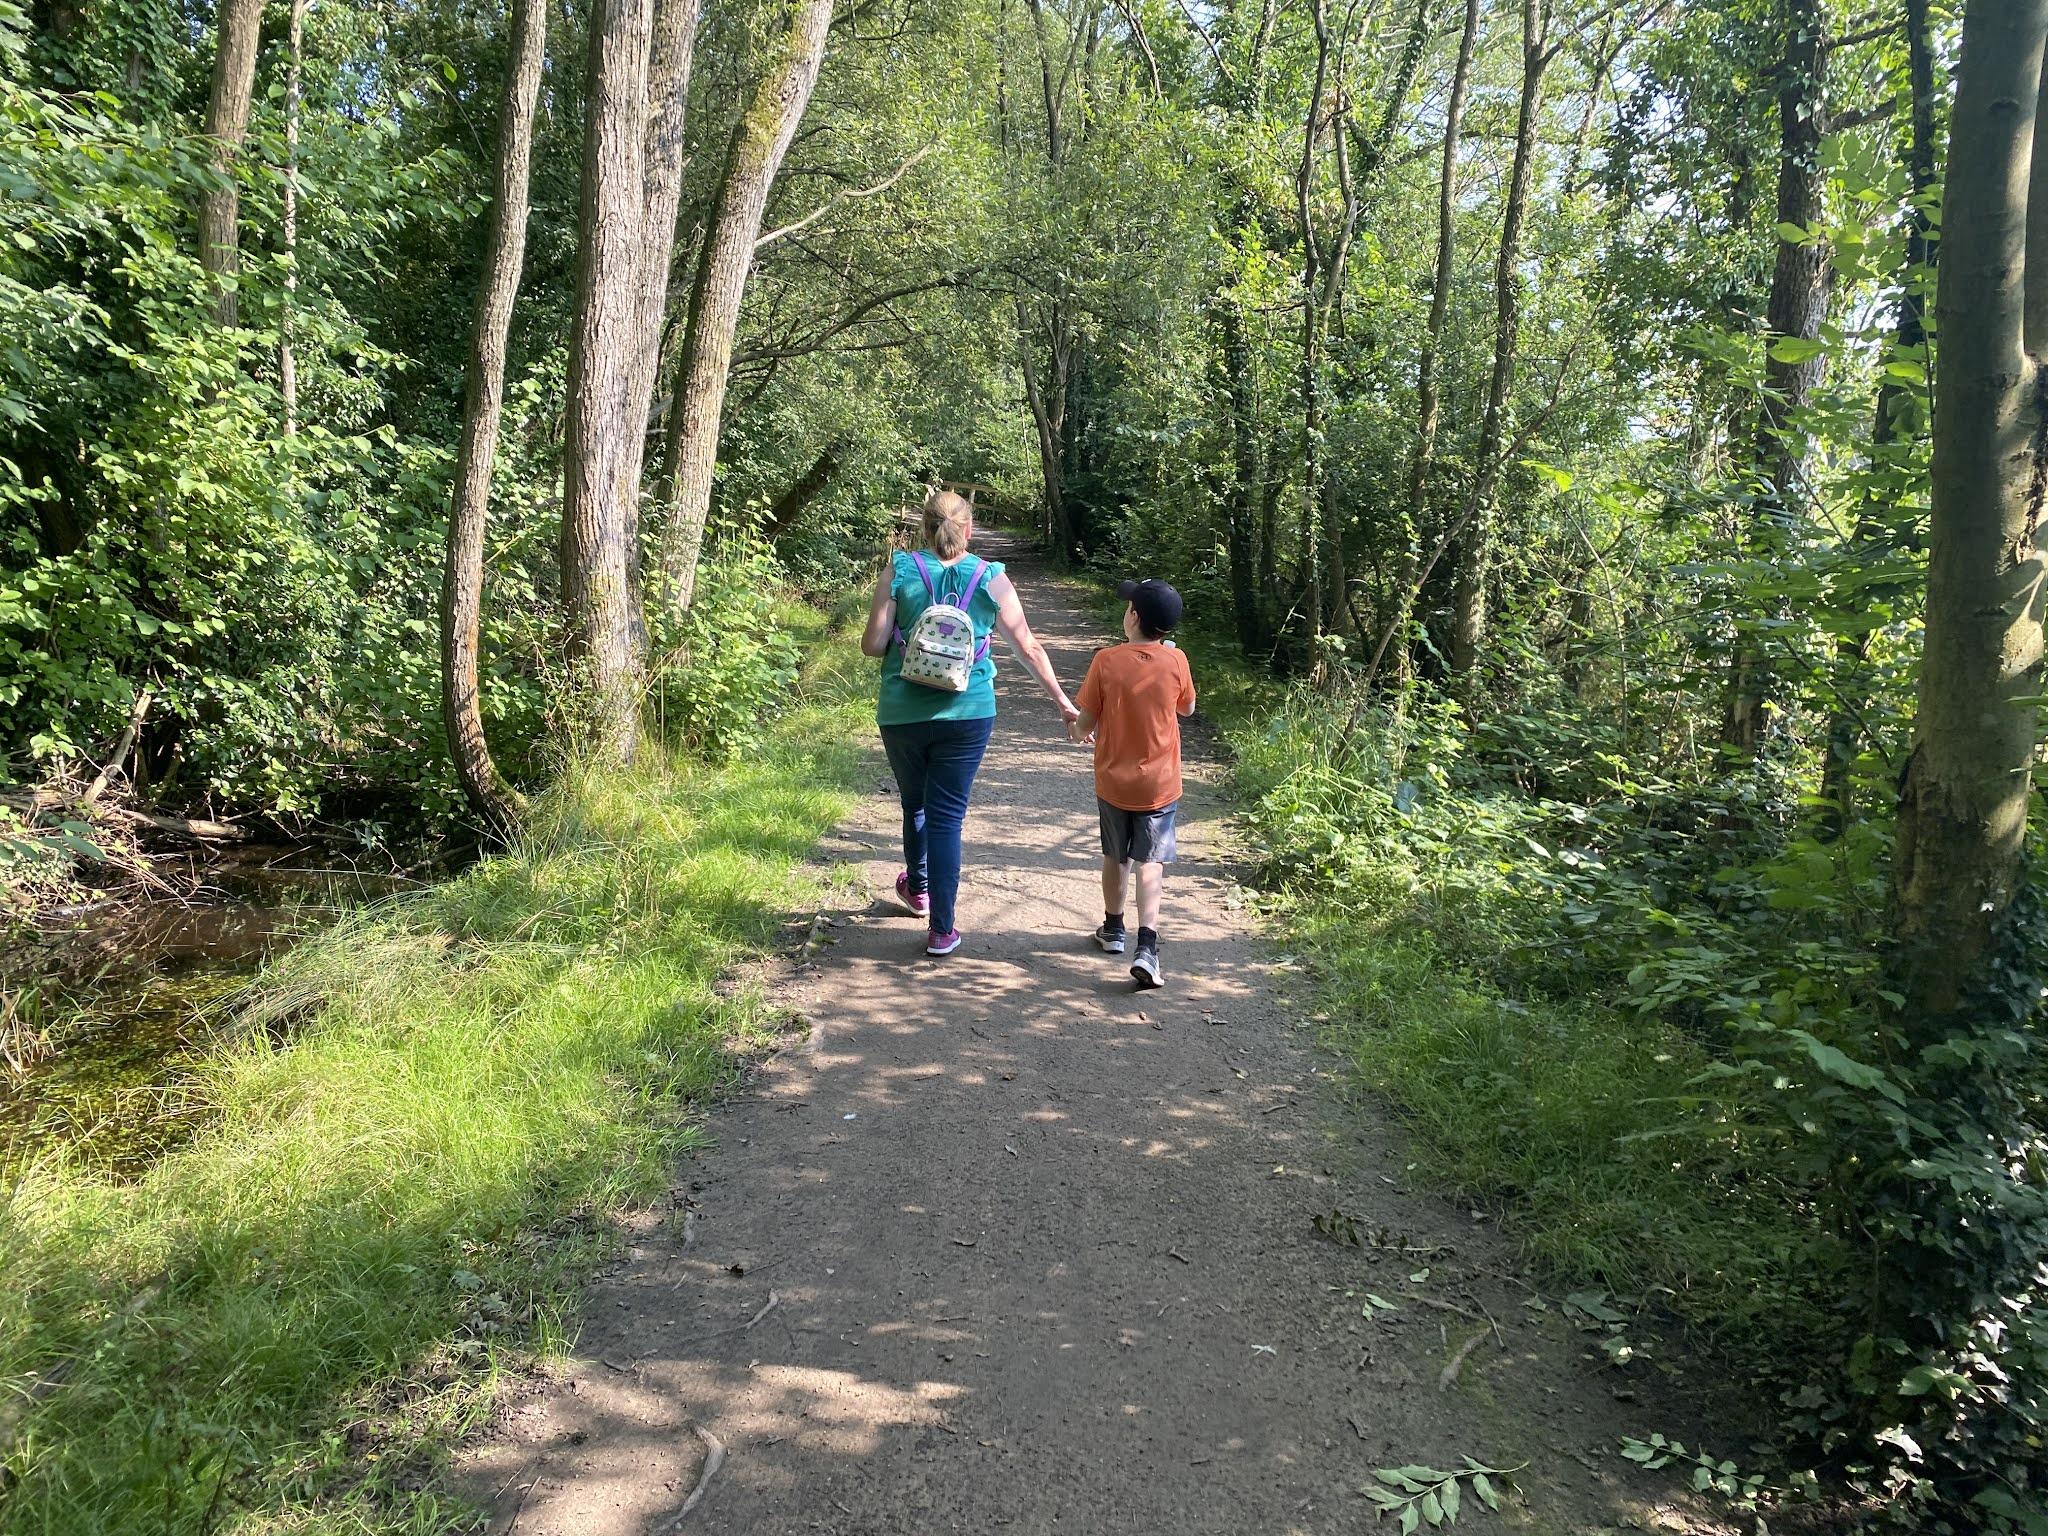 mum and son walking